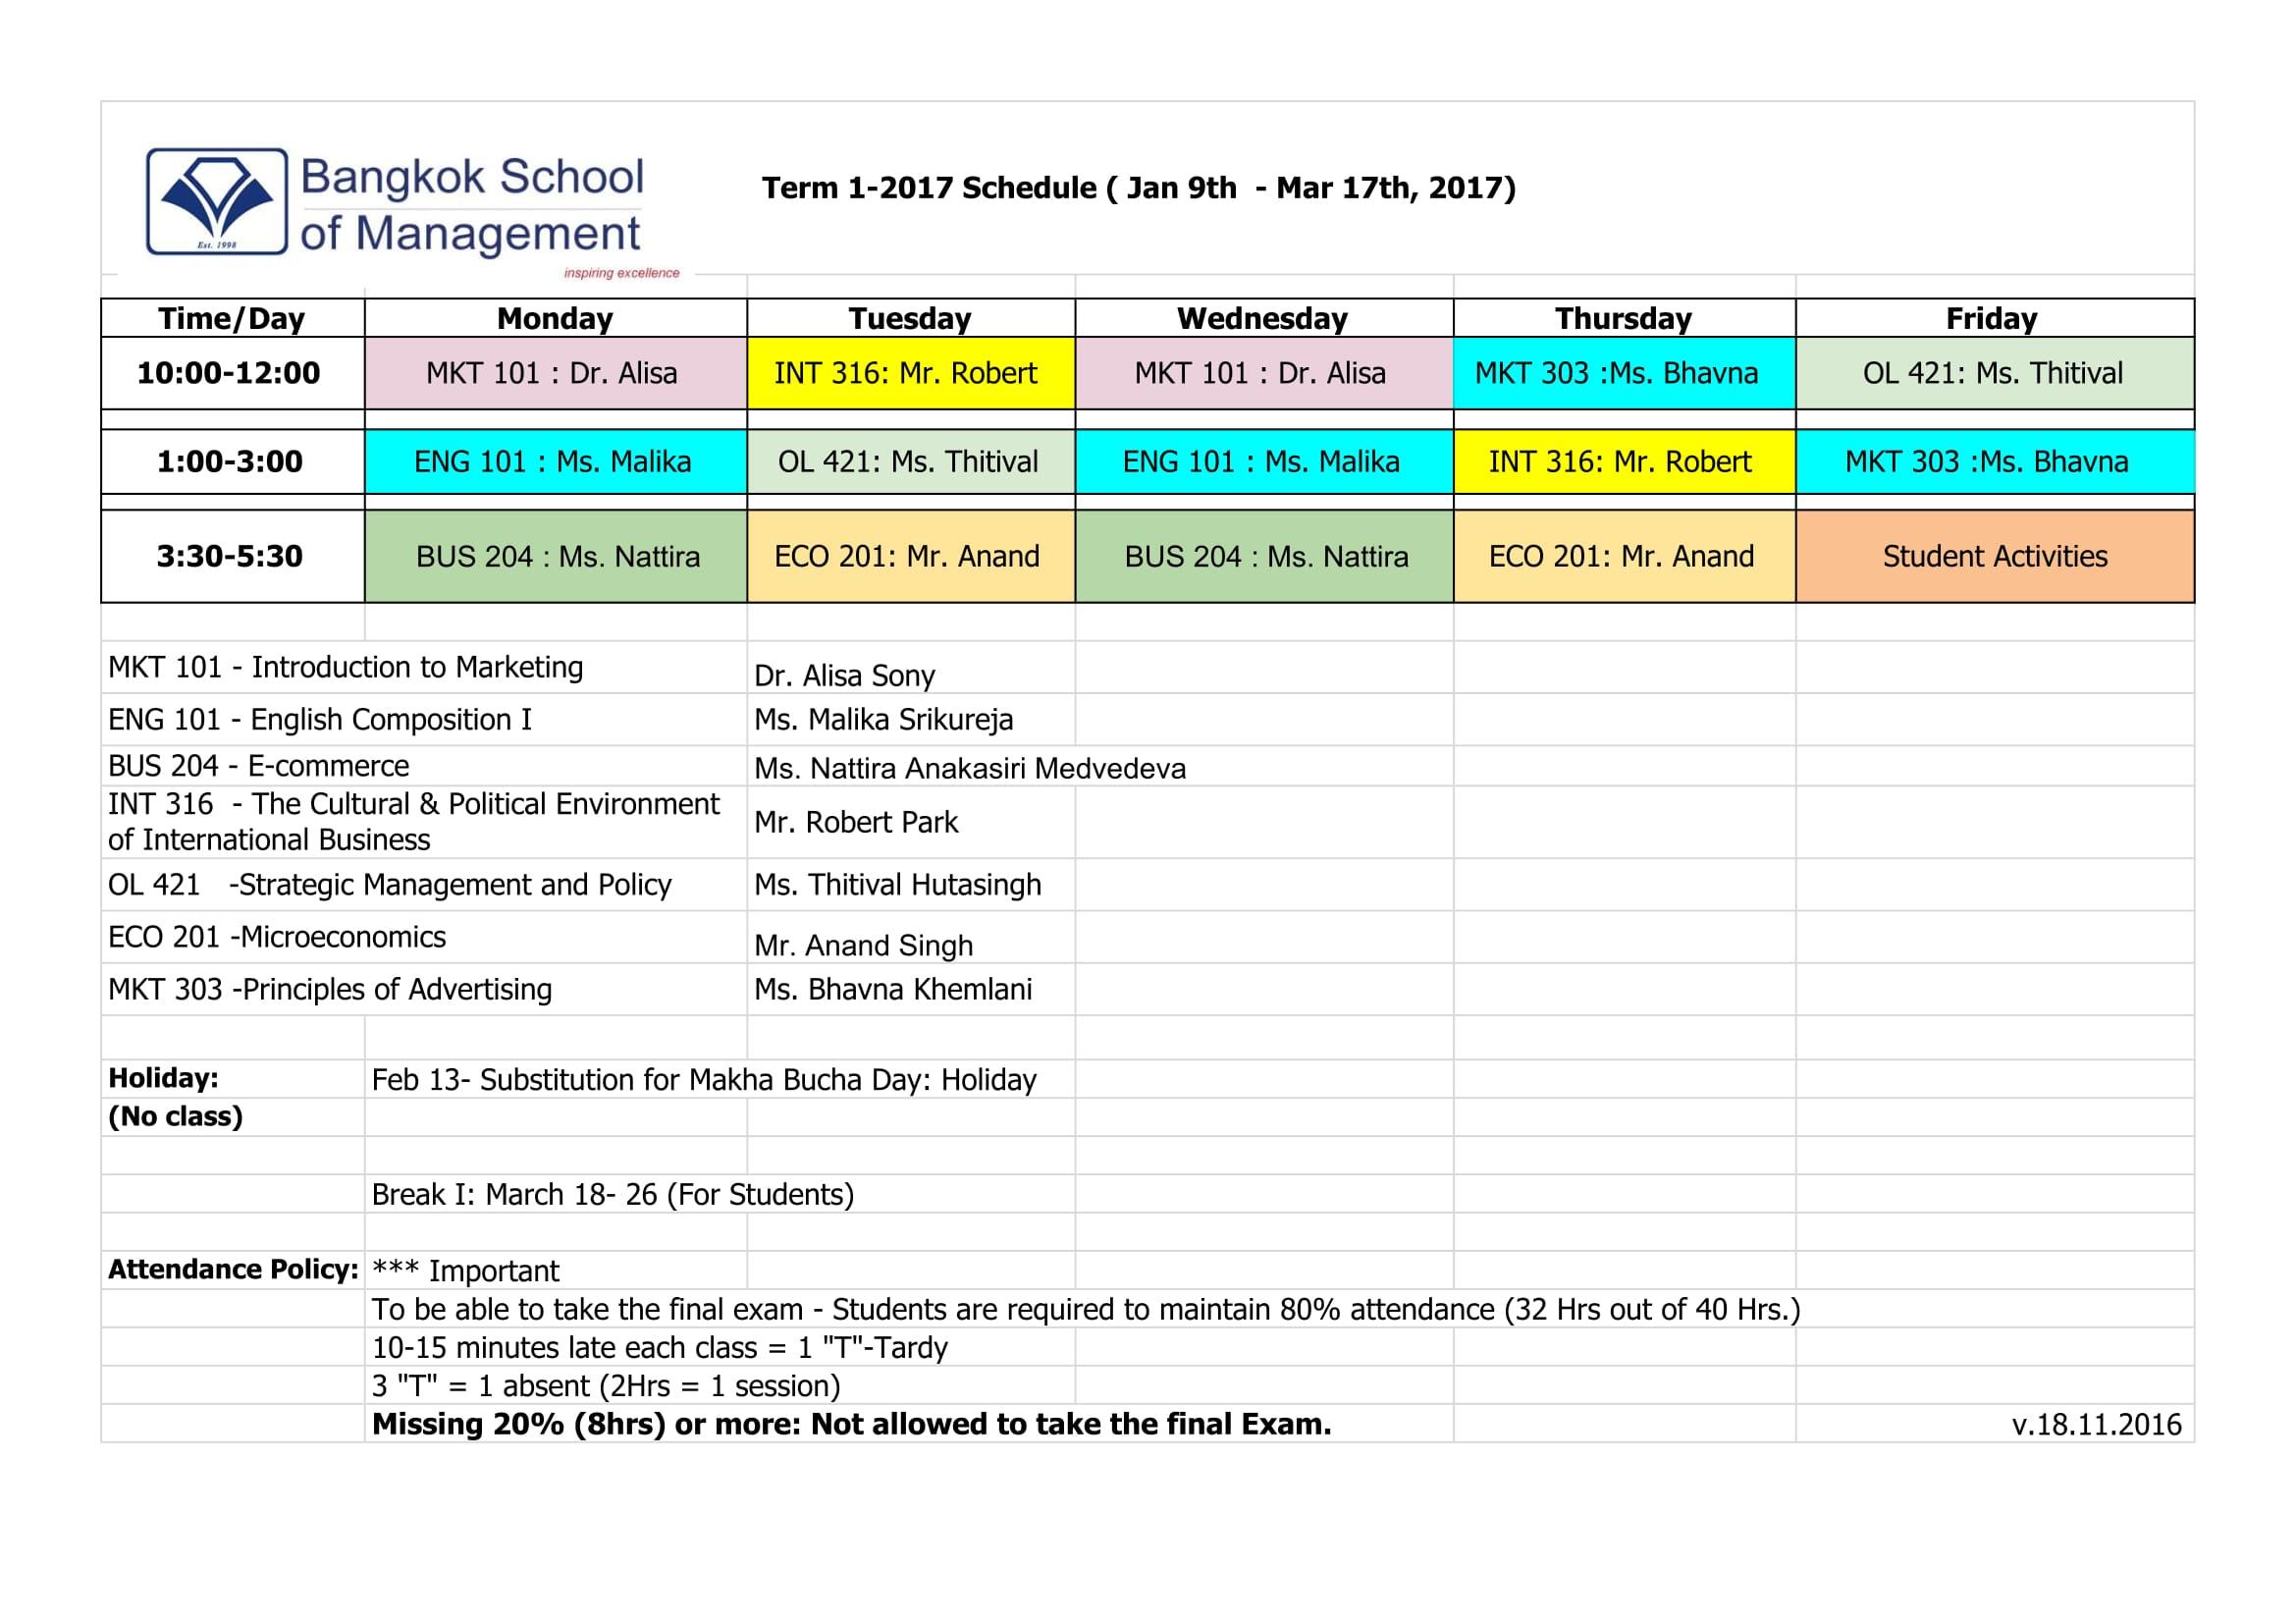 Term 1-2017 Schedule.xlsx-1